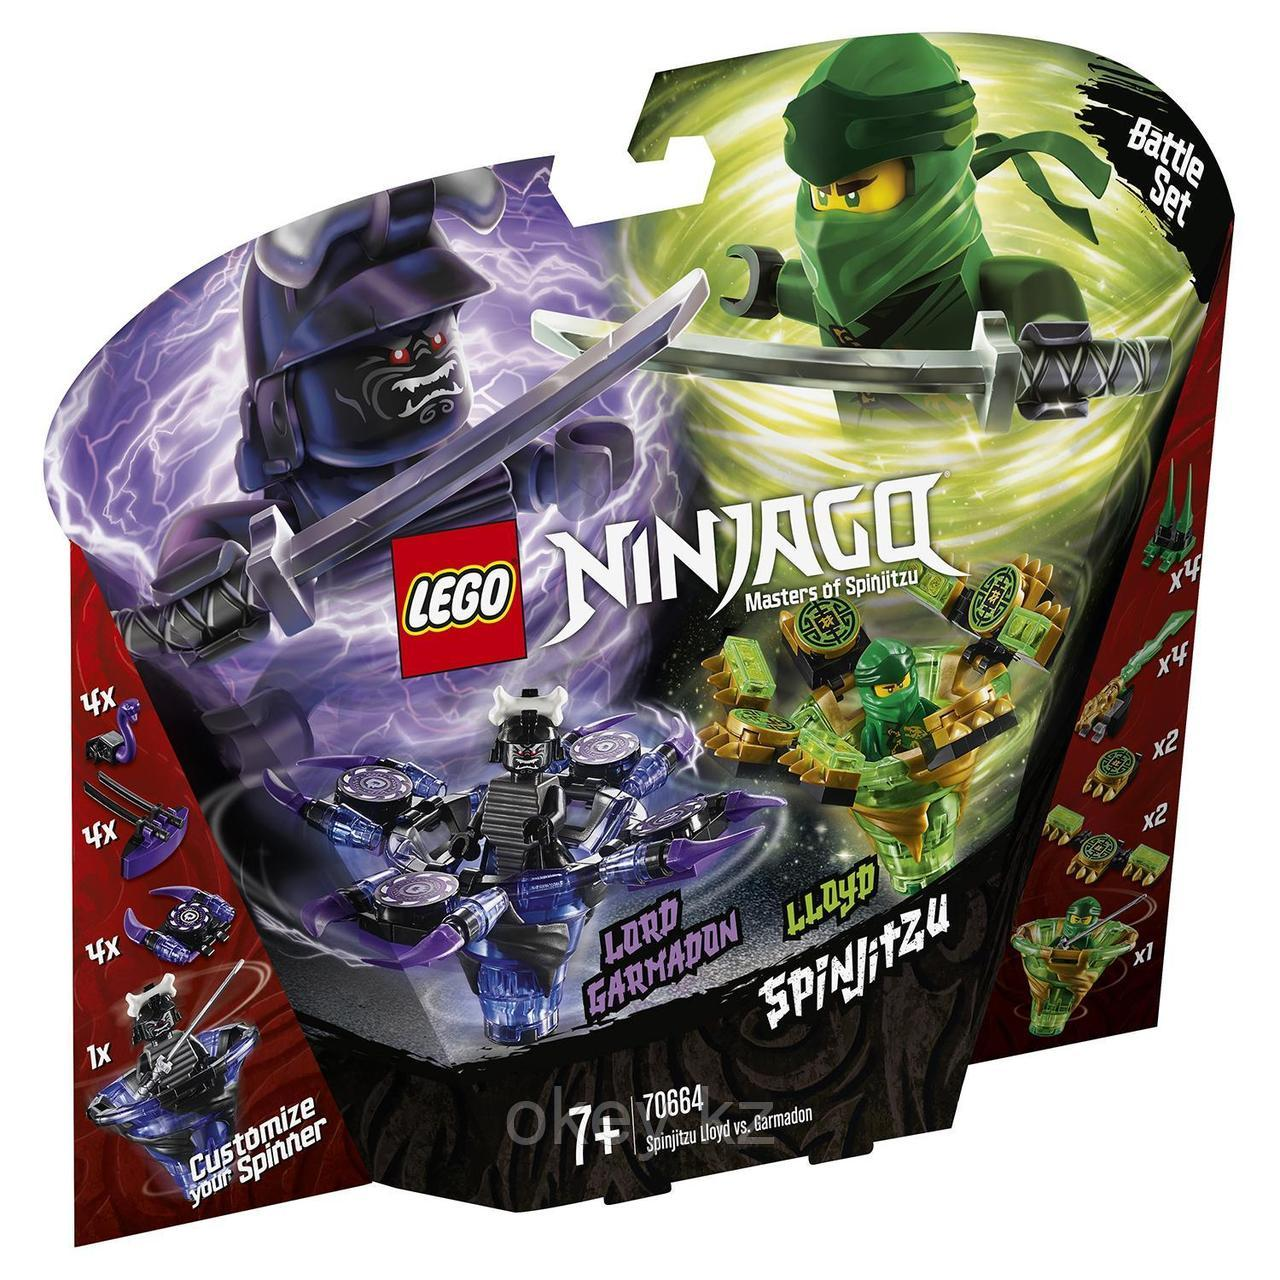 LEGO Ninjago: Ллойд мастер Кружитцу против Гармадона 70664